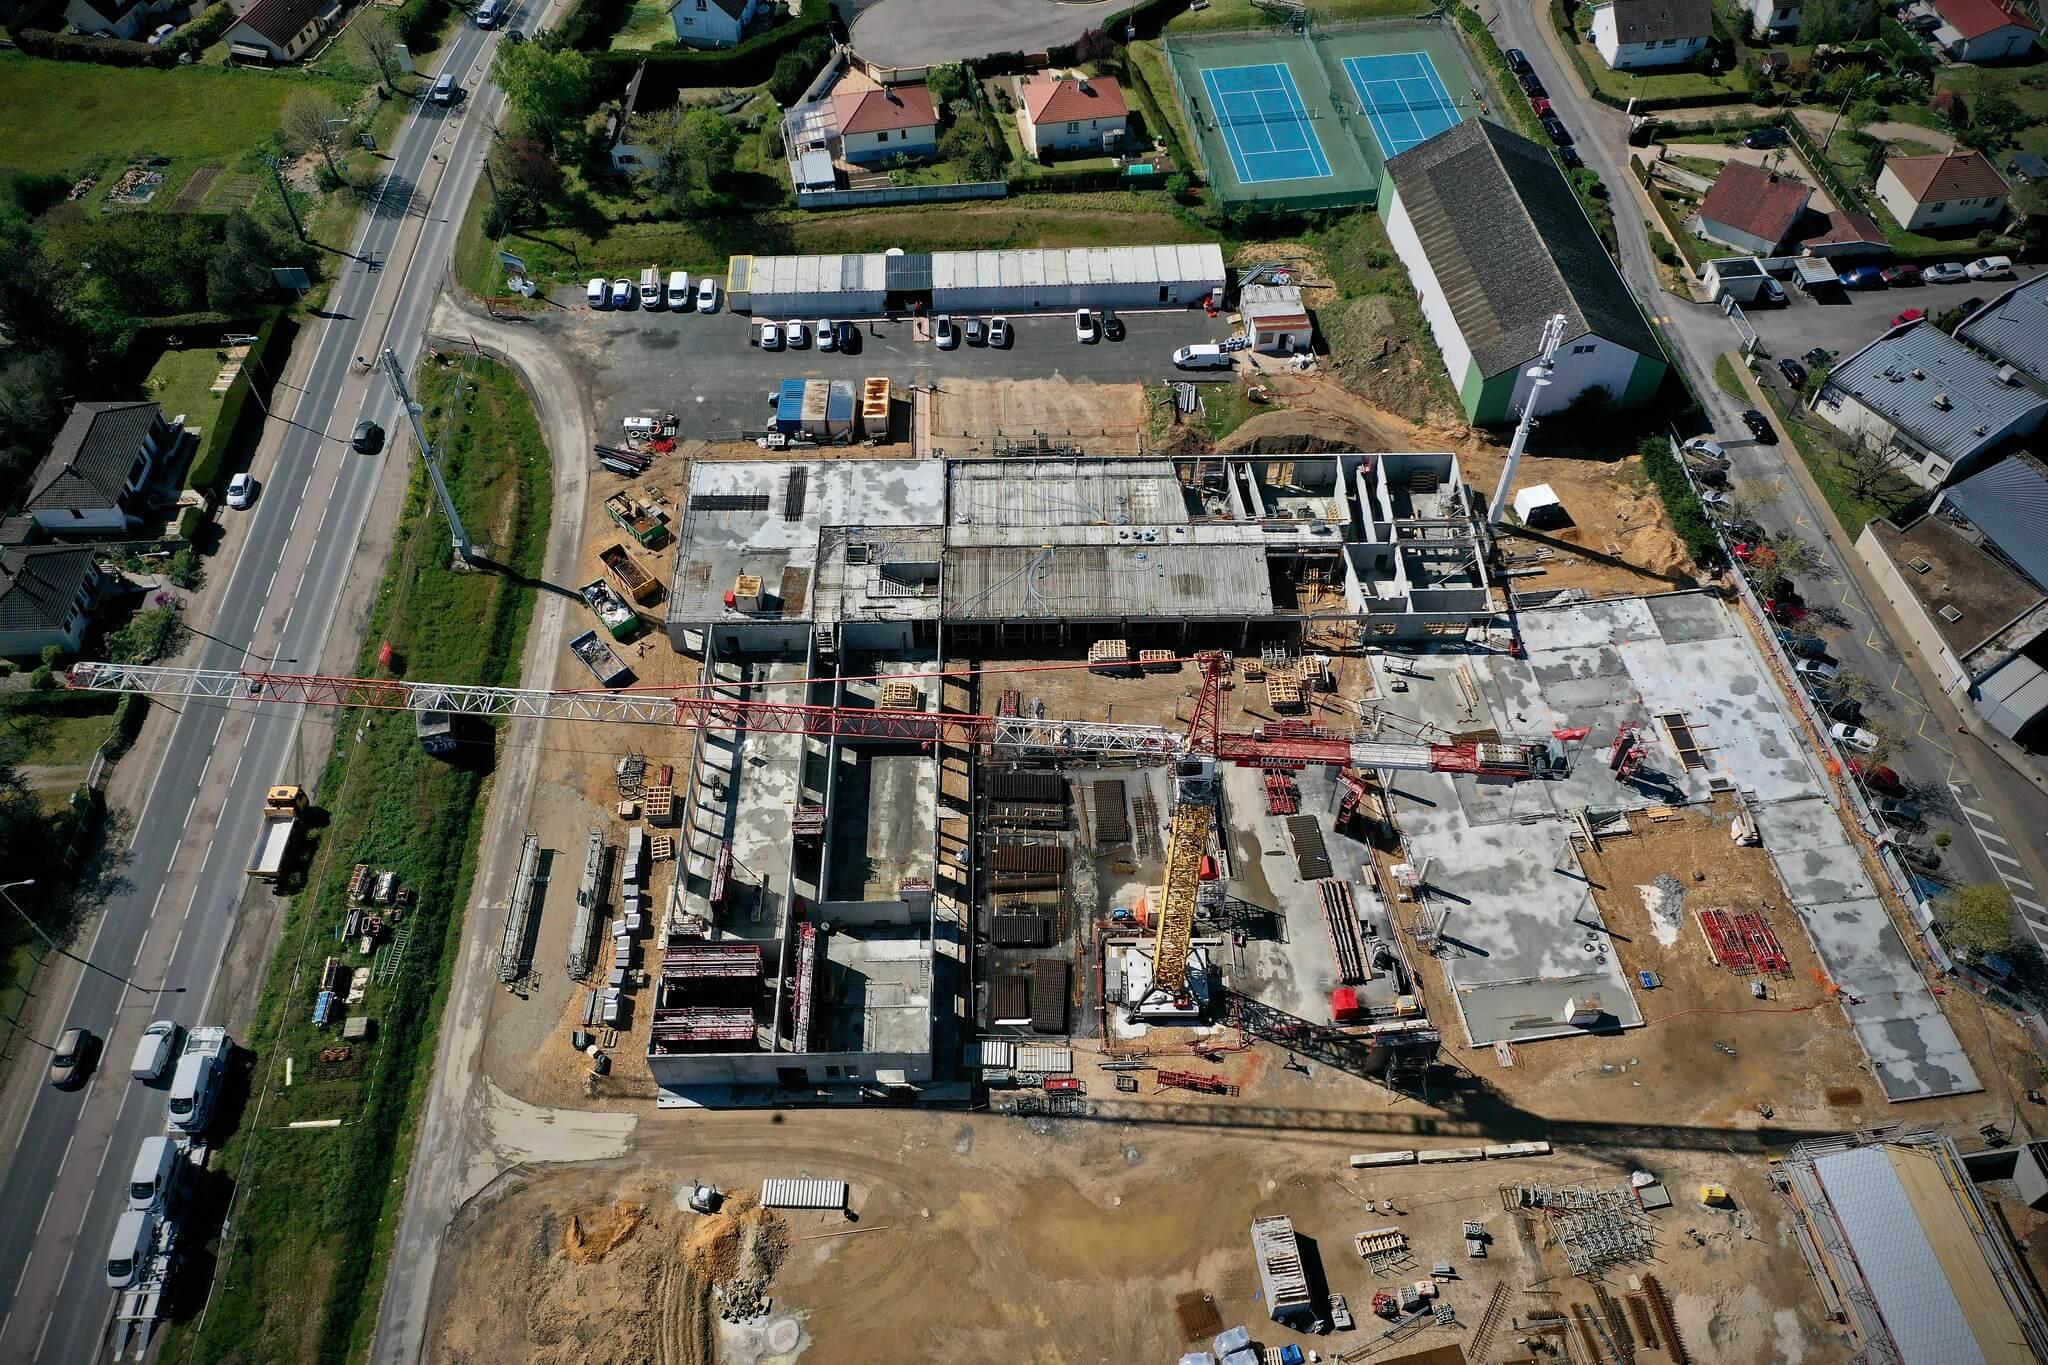 illustrer le chantier de constructin dun college